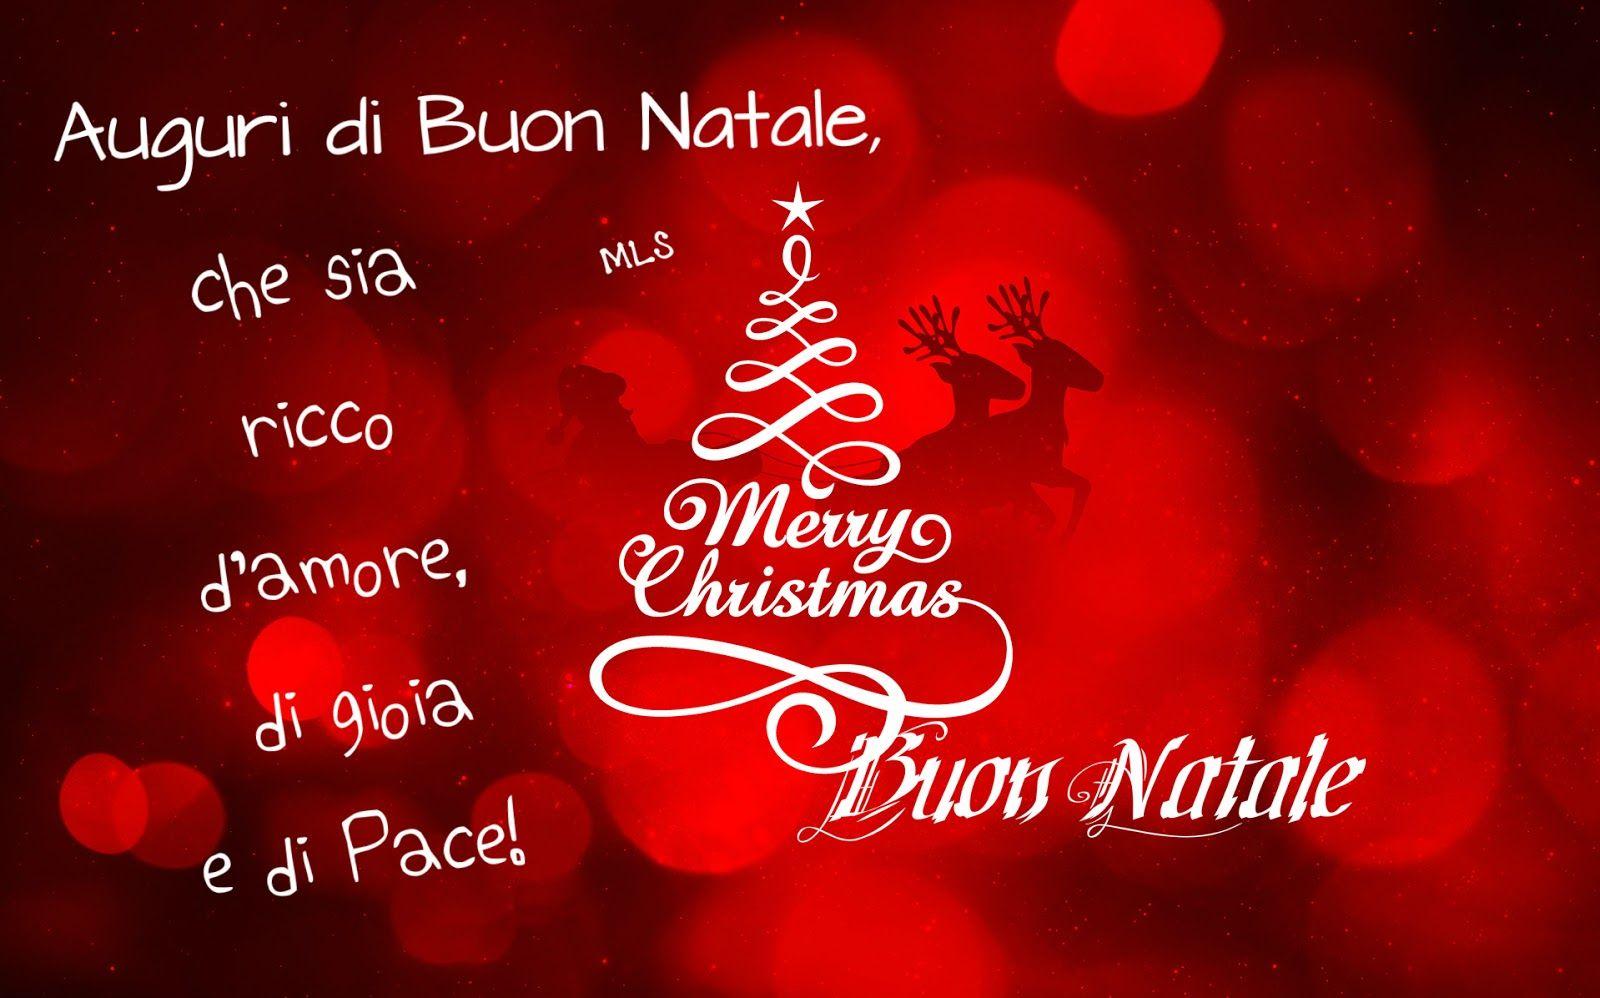 Frasi Romantiche Di Natale.Frasi D Amore A Natale Disegni Di Natale 2019